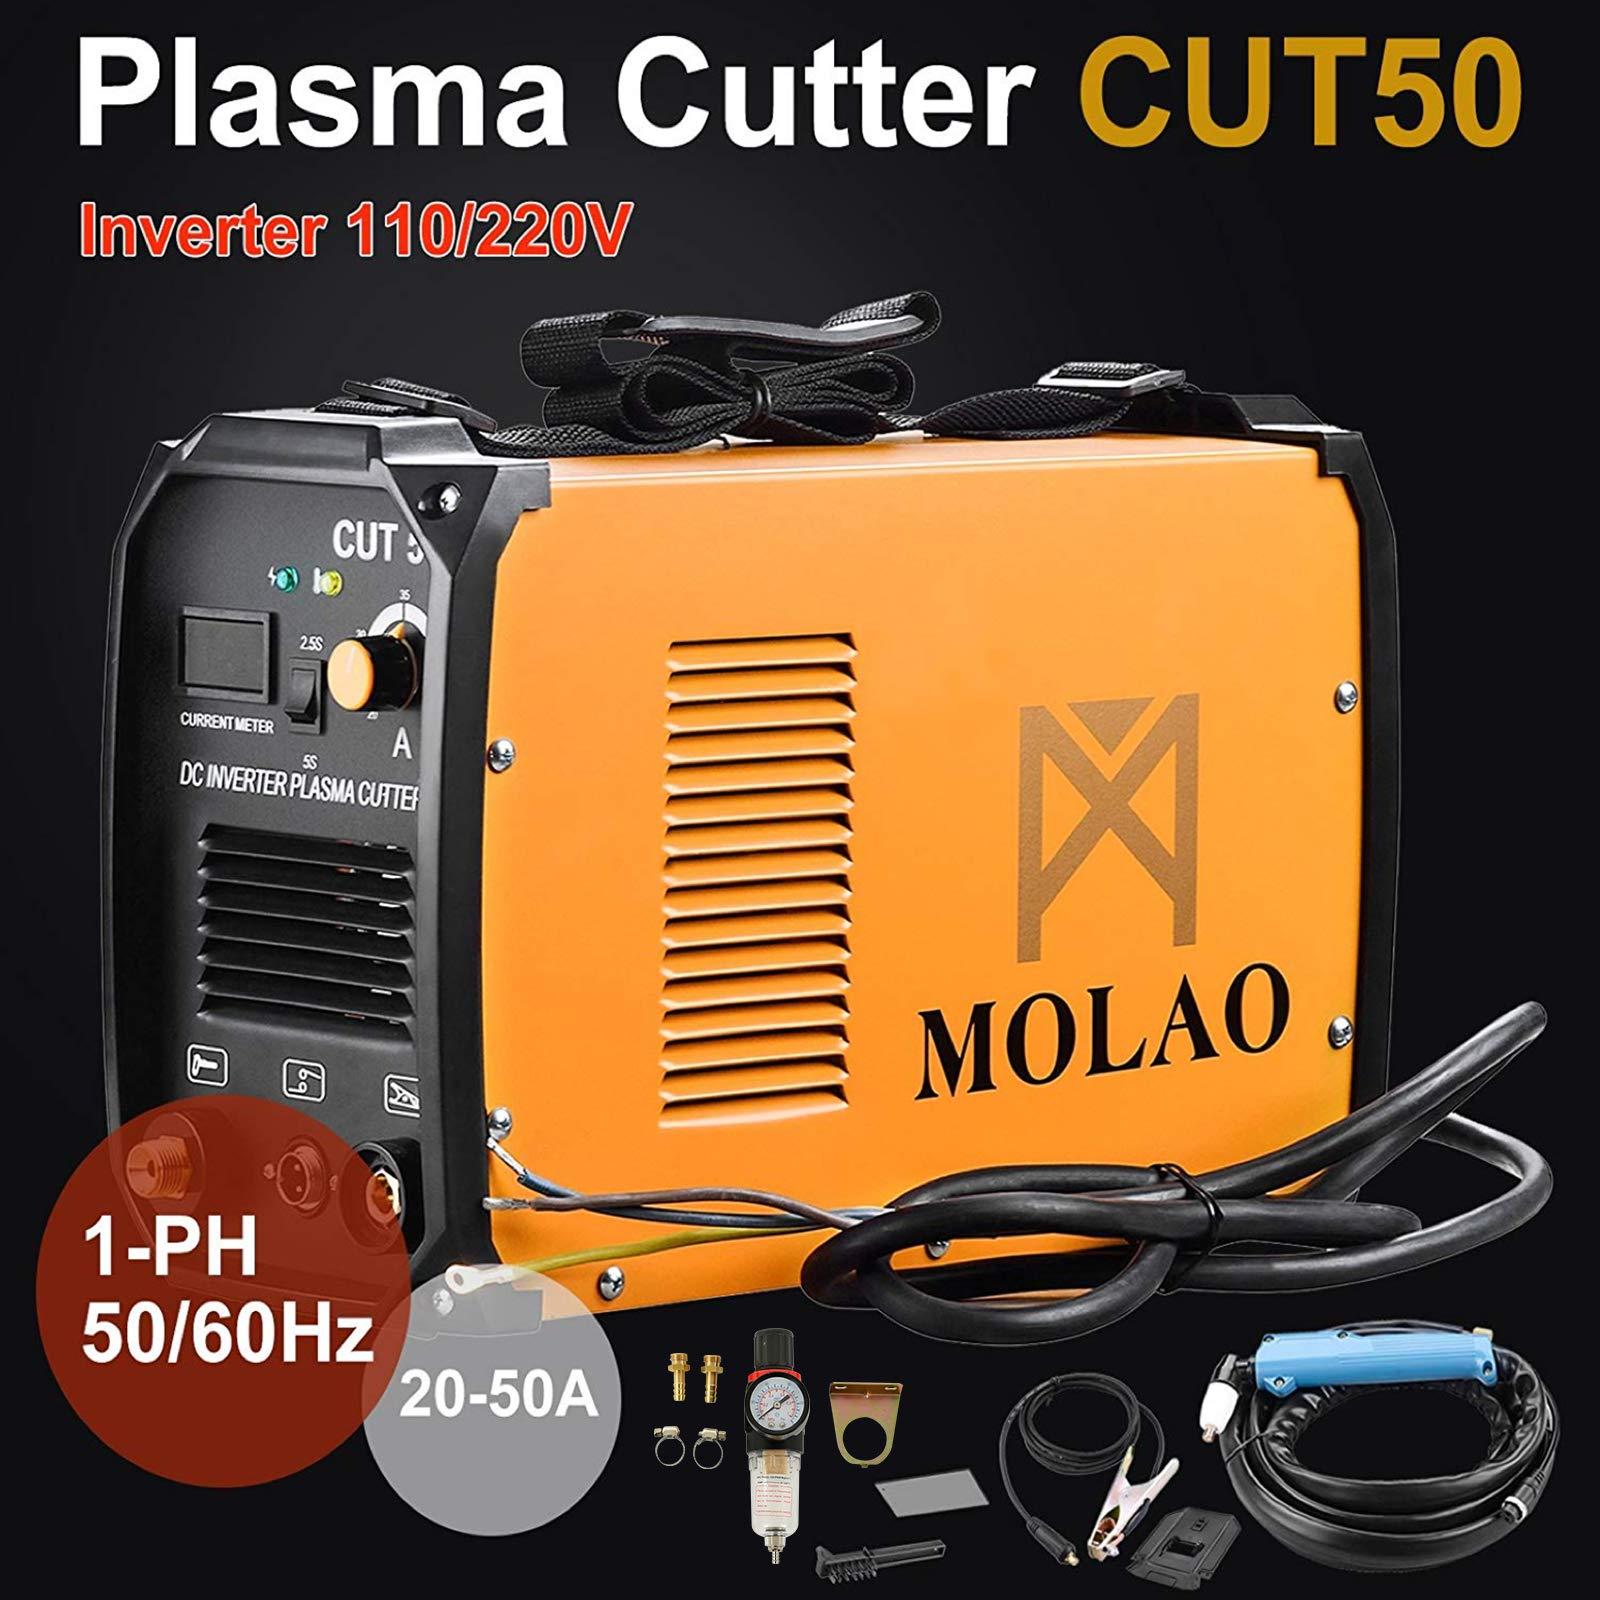 SUNCOO Cut-50 Plasma Cutter Electric DC Inverter Cutting Machine with Digital Display Dual Voltage 110/220V, 1/2'' Clean Cut by SUNCOO (Image #4)